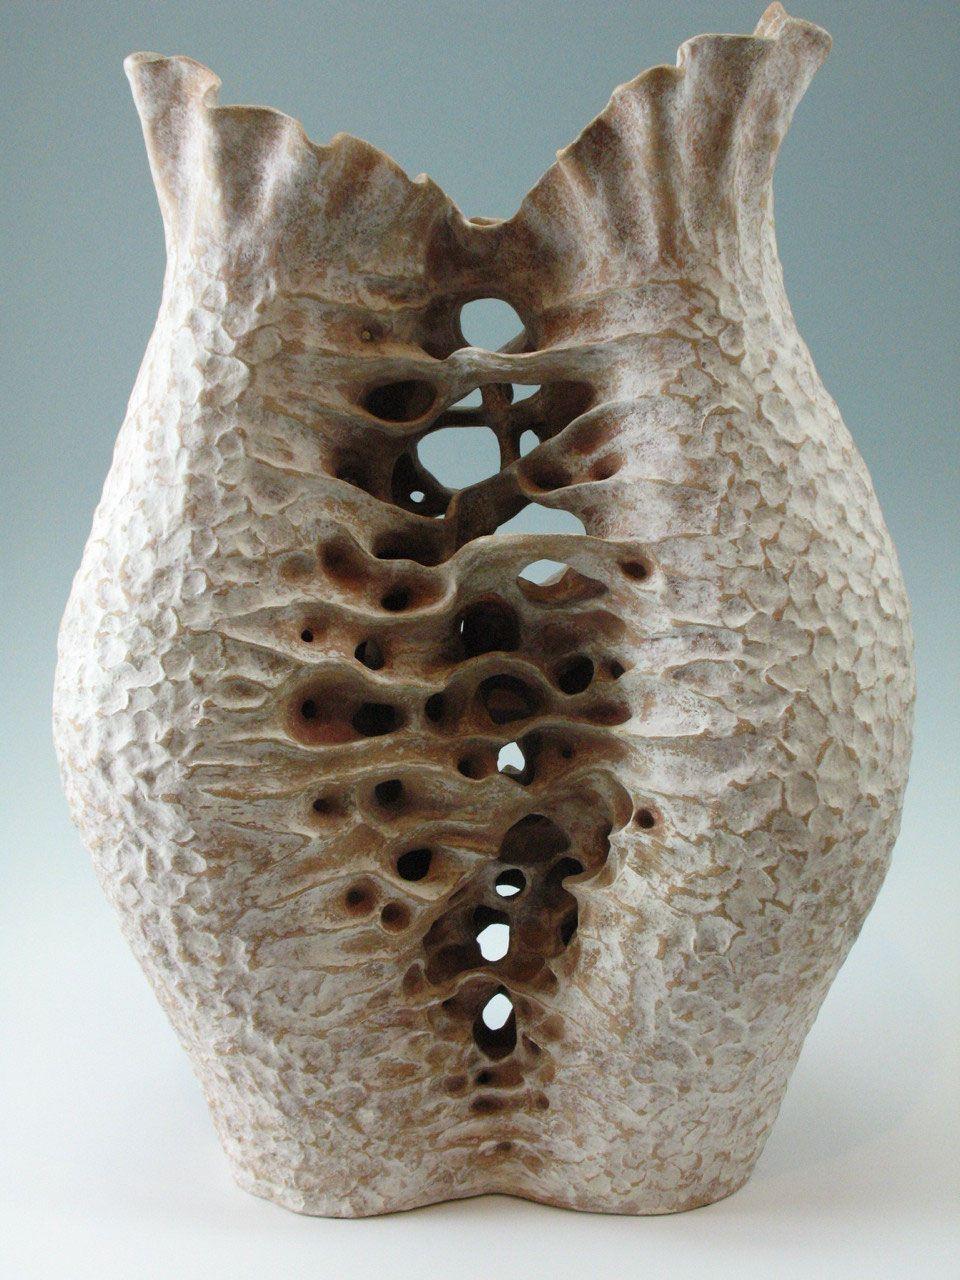 Abstract Organic Form By Elizabeth Shriver Organic Sculpture Organic Ceramics Organic Form